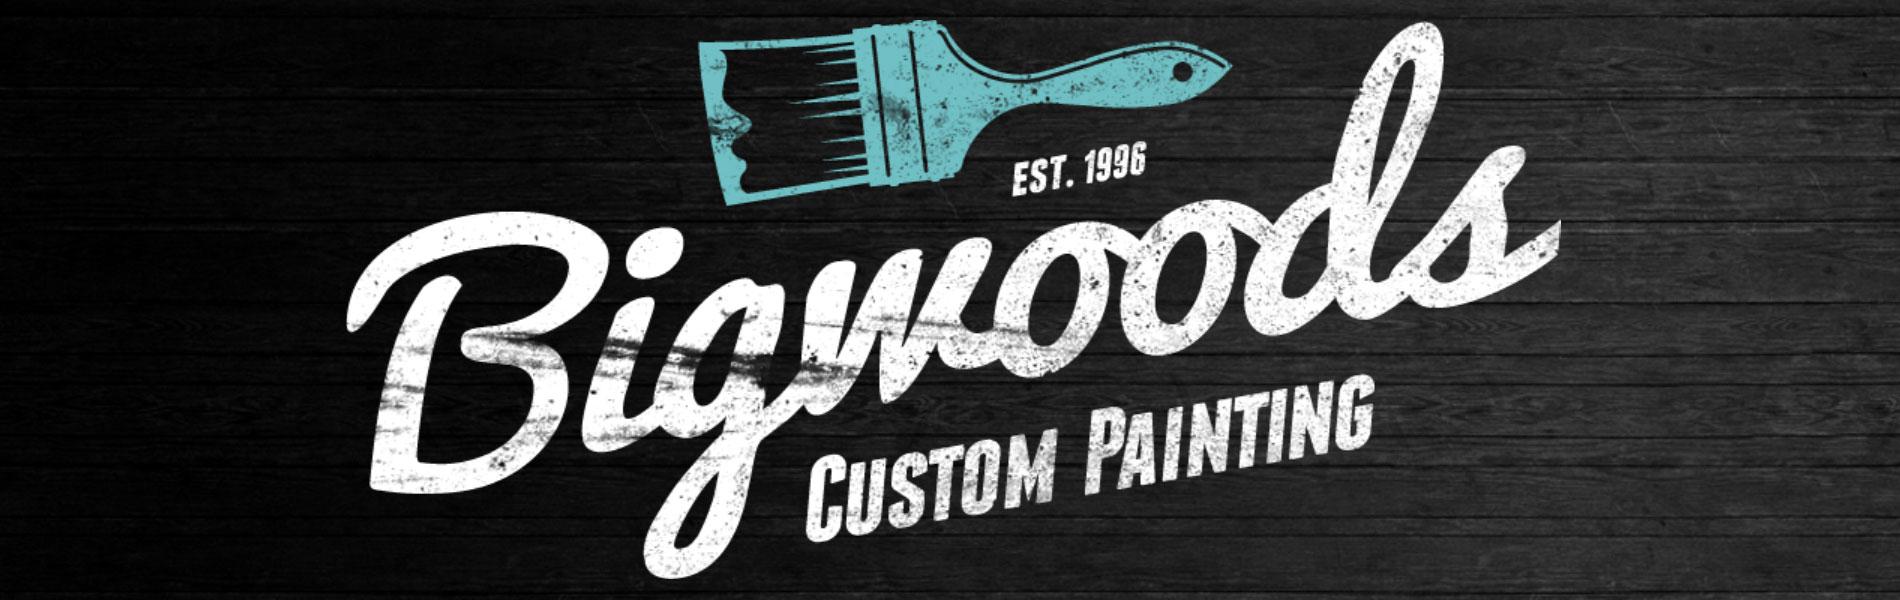 Welcome to Bigwoods Custom Painting